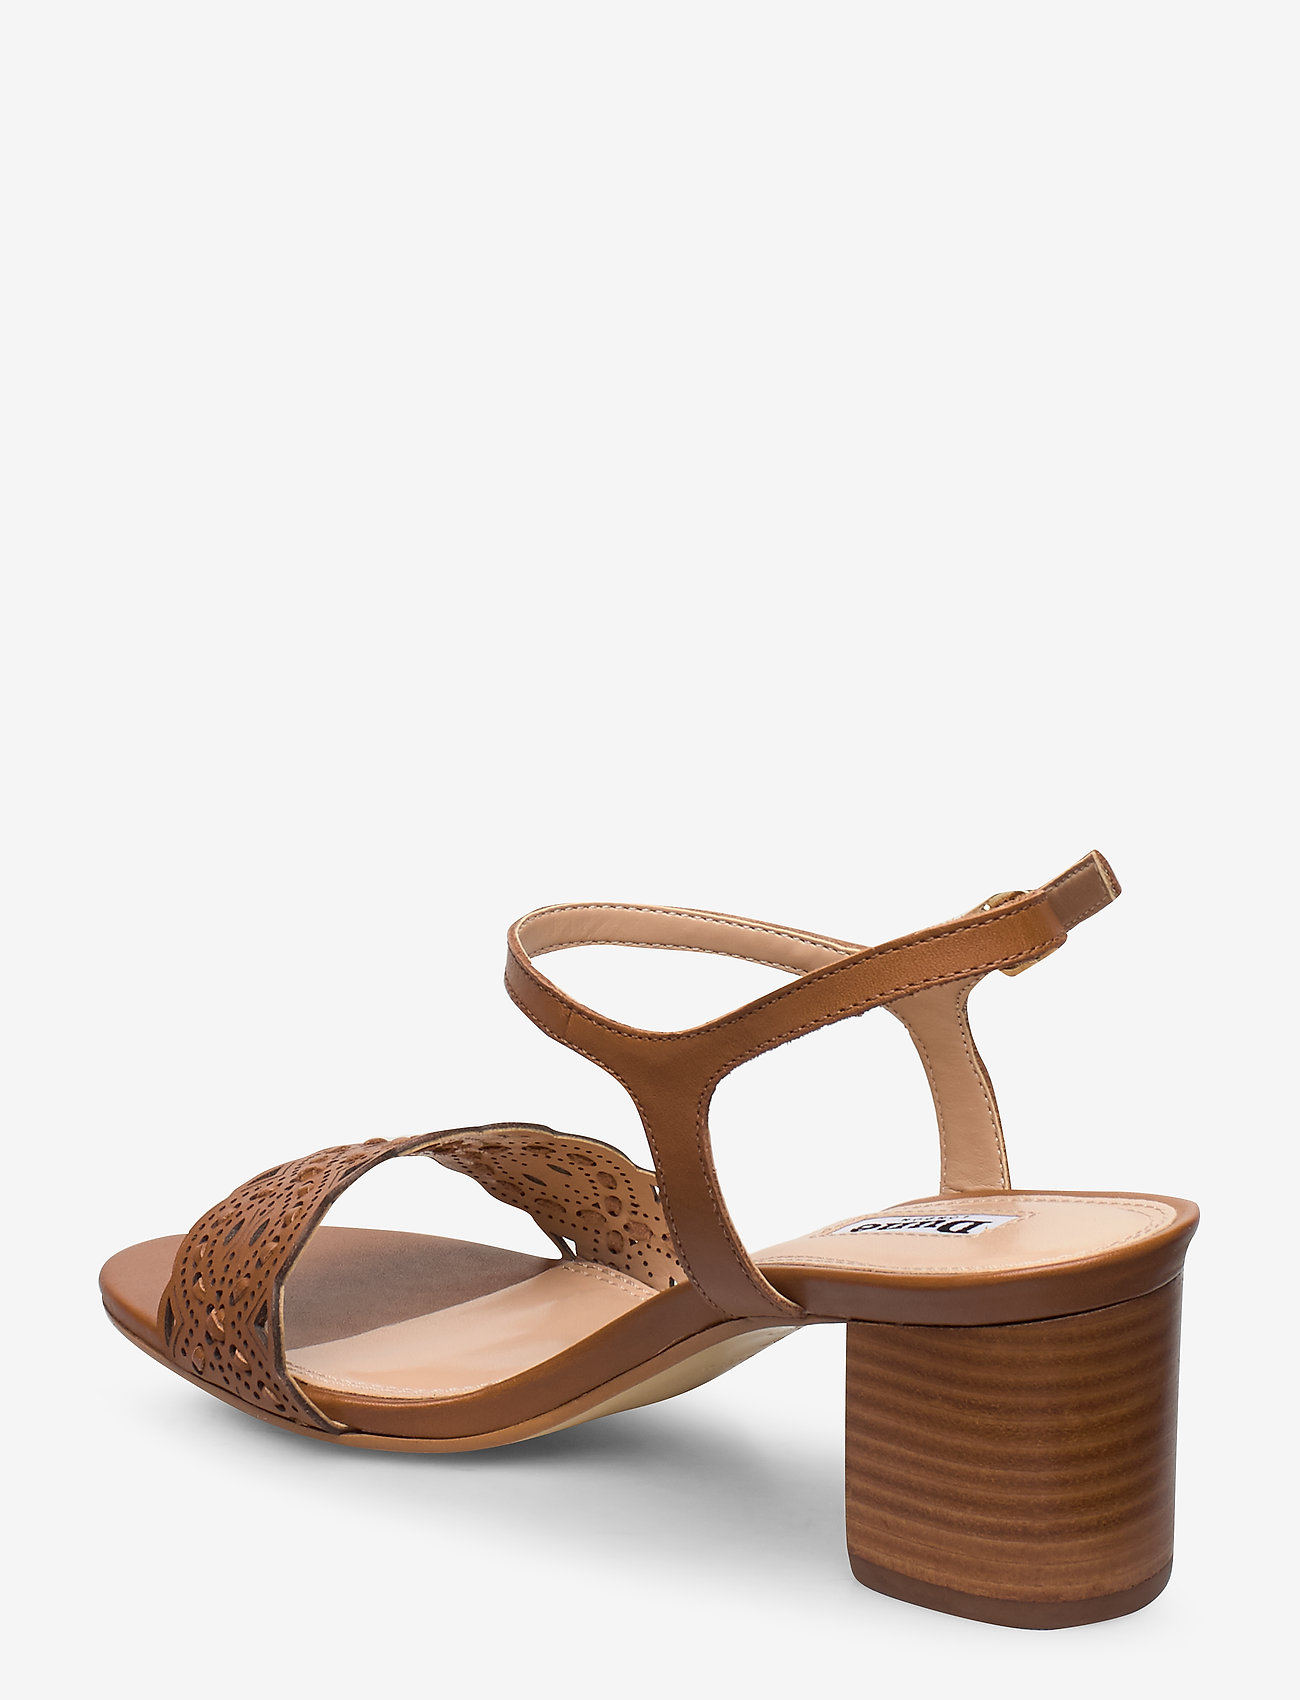 Jella (Tan-leather) - Dune London